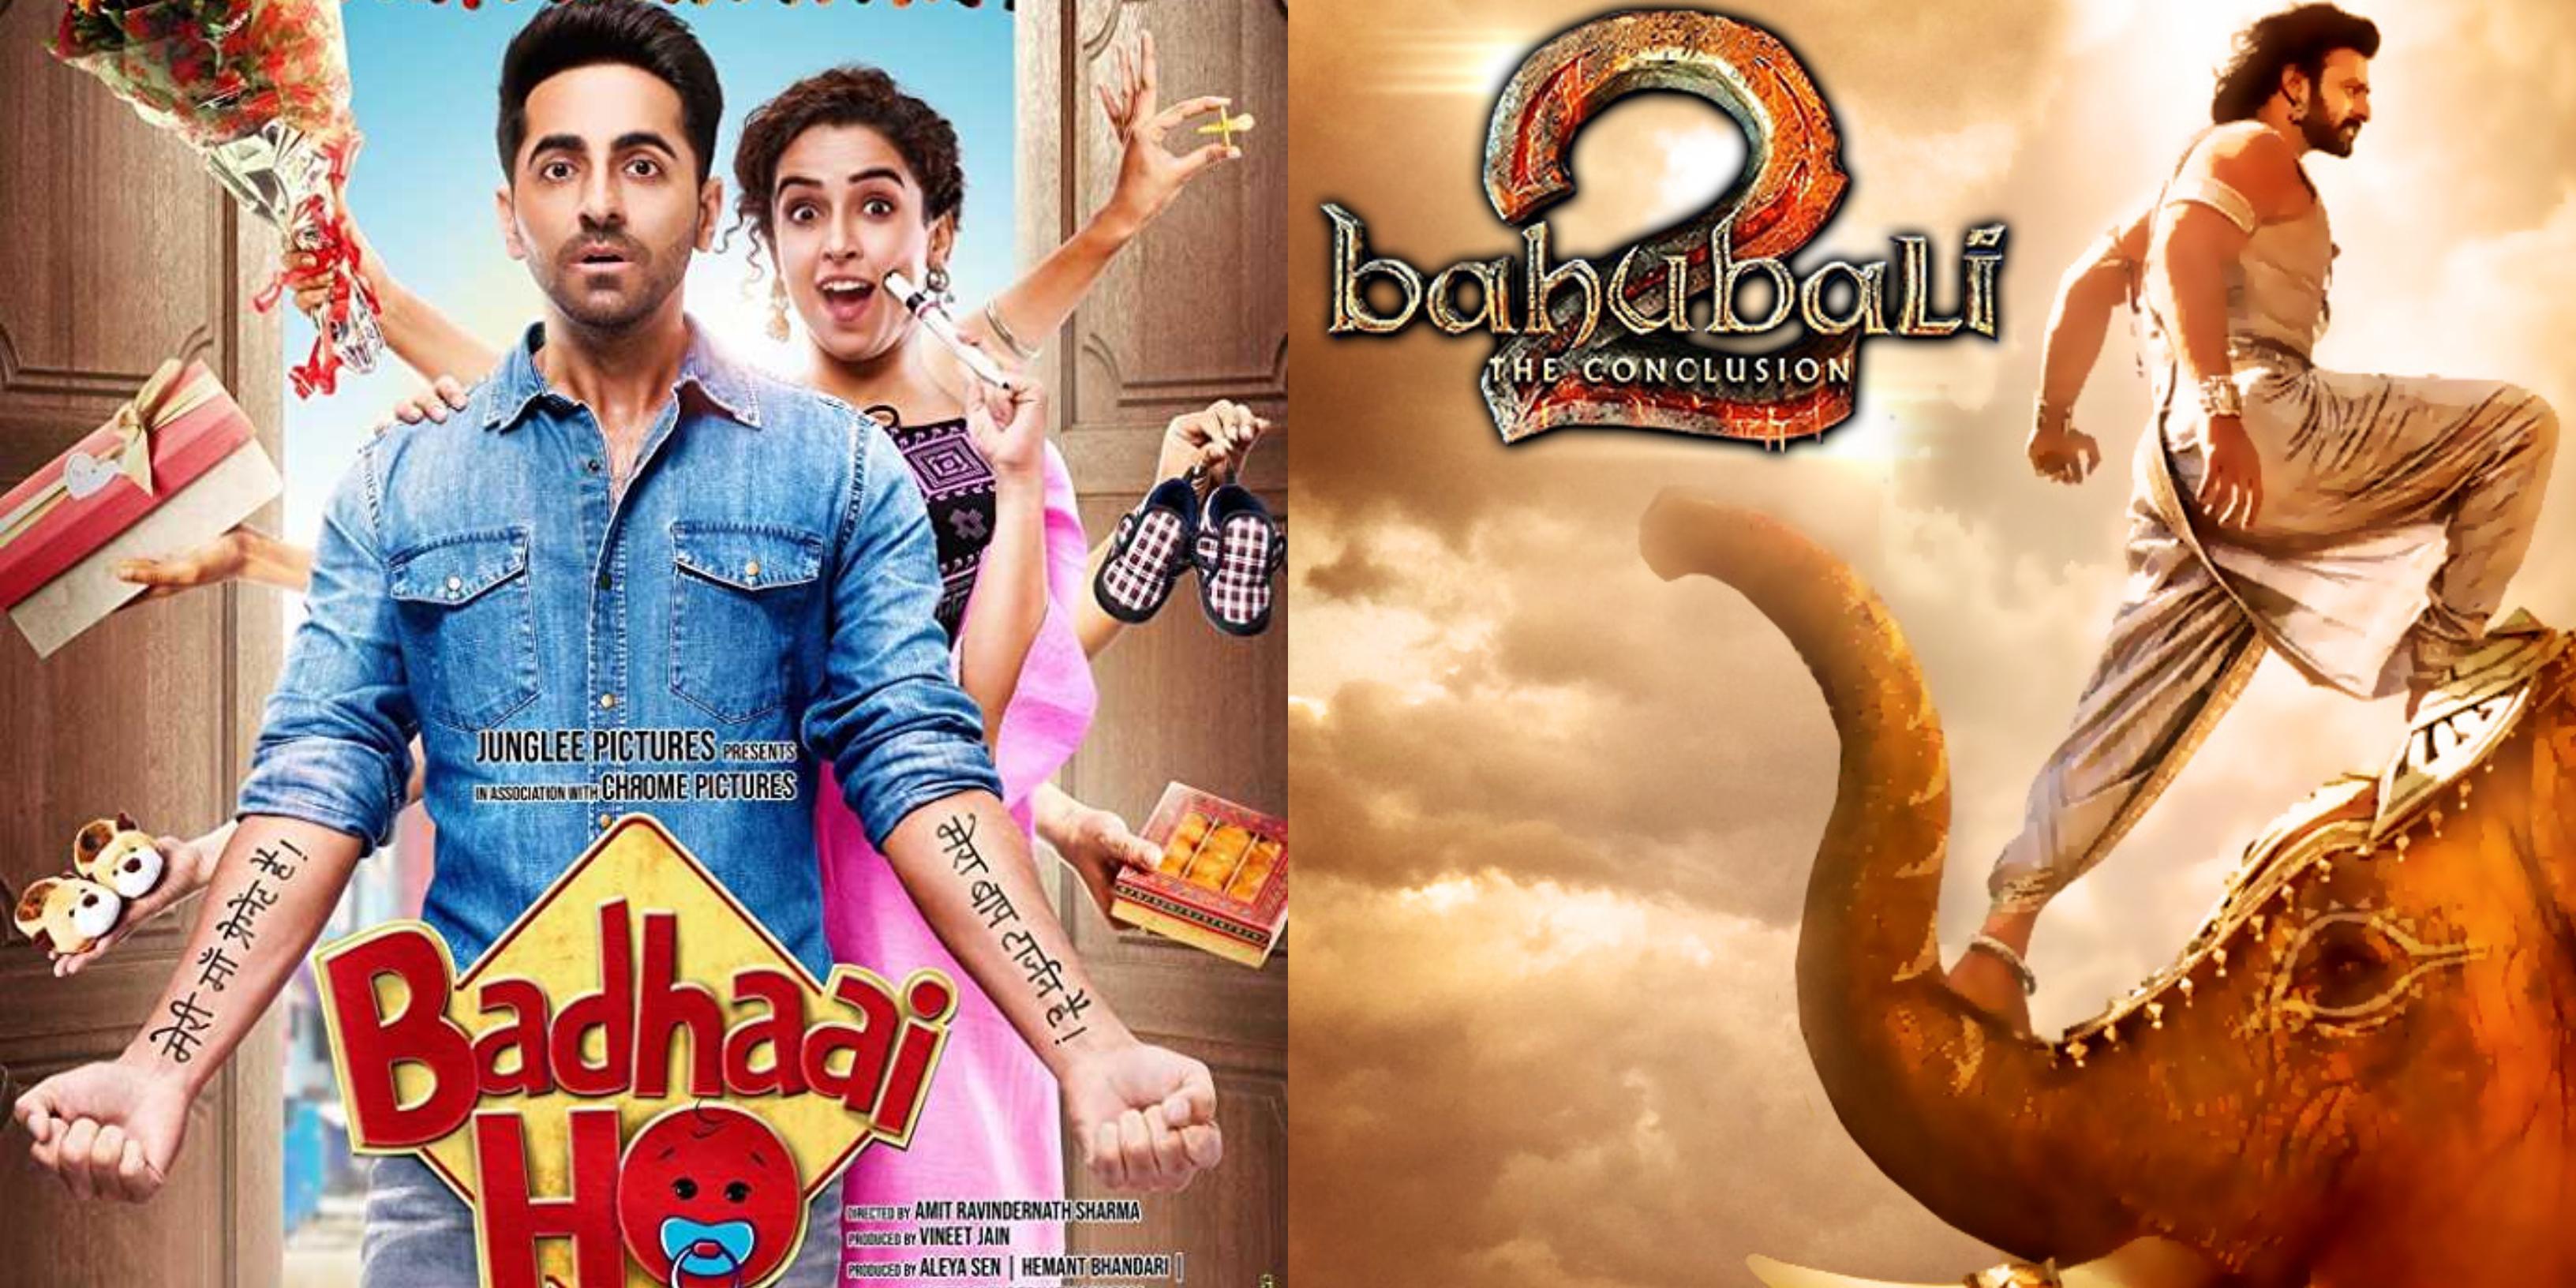 'Badhaai ho' breaks record